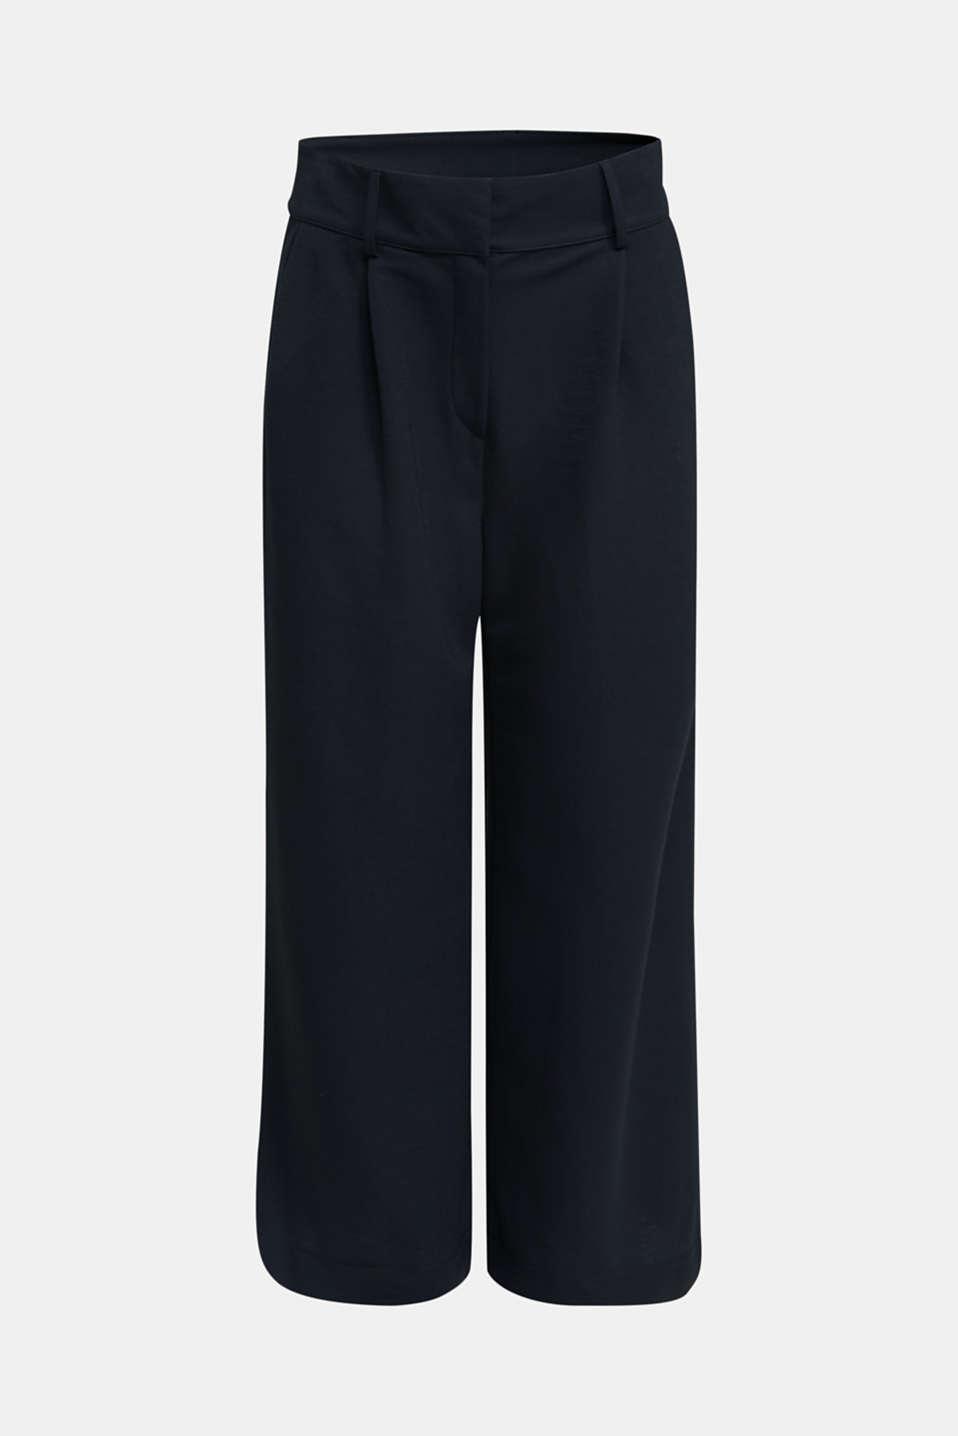 Soft jersey culottes, BLACK, detail image number 7